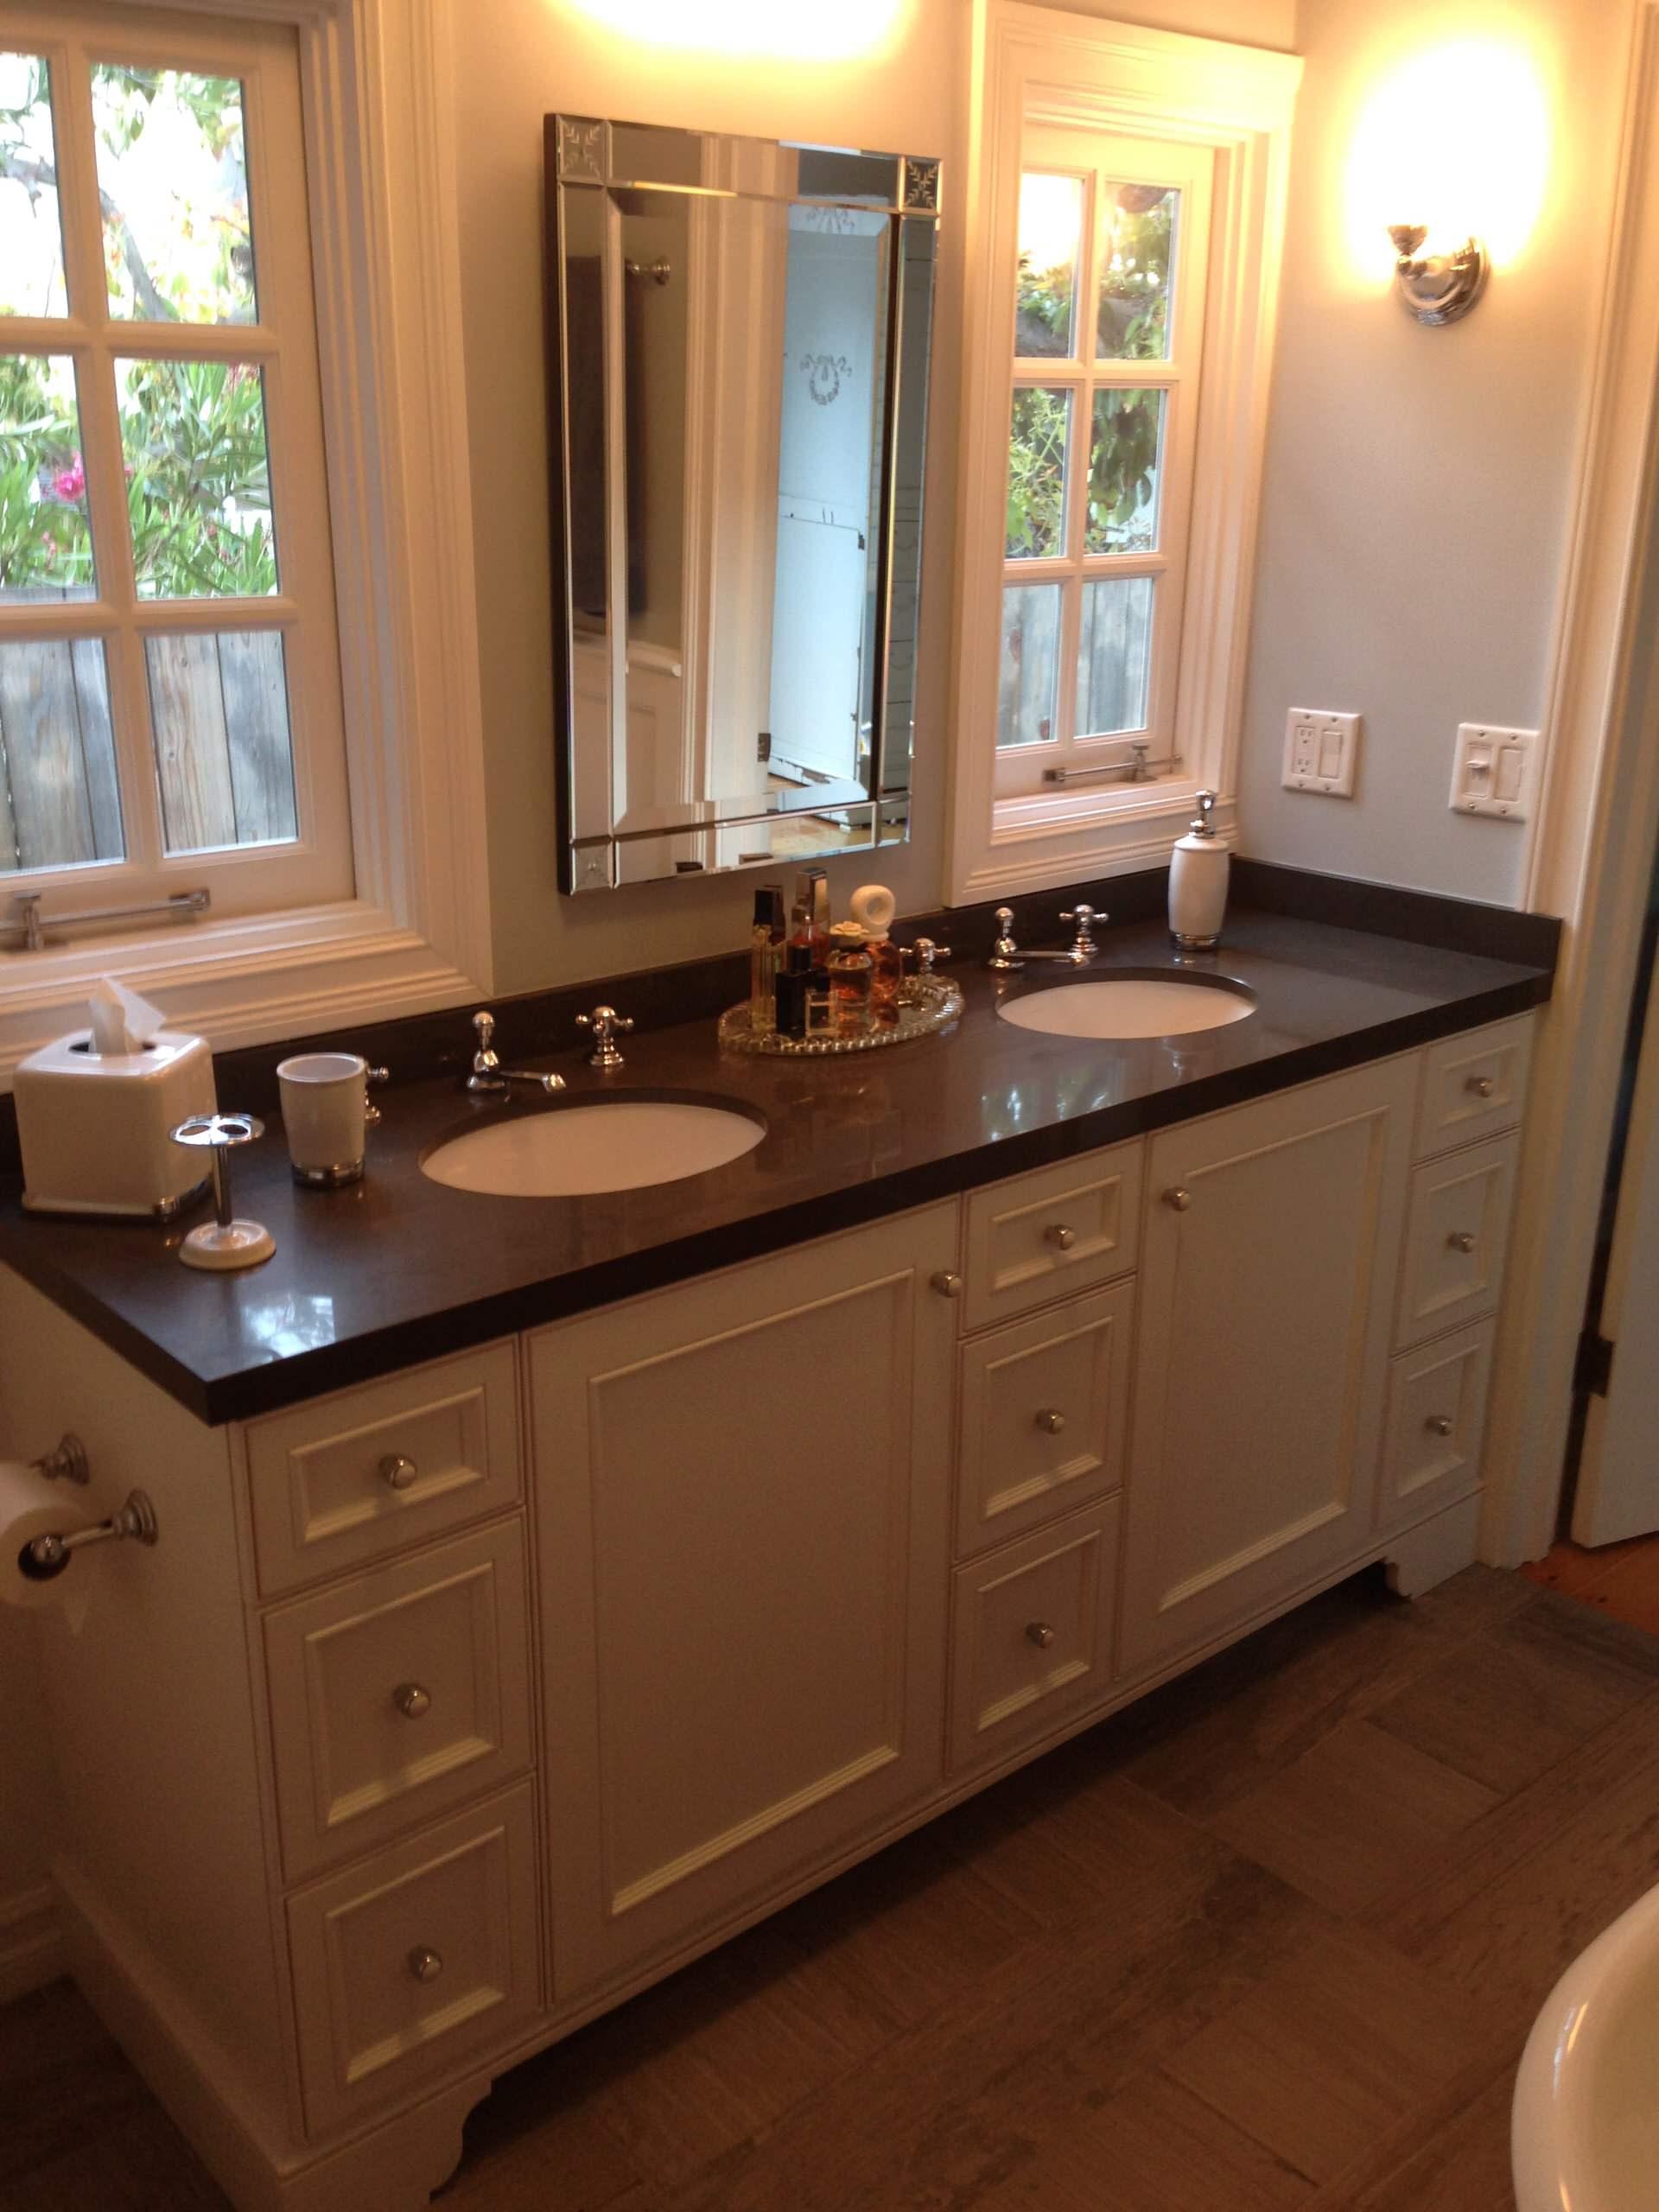 Bel Air Kitchen, Master Bath & Laundry Room